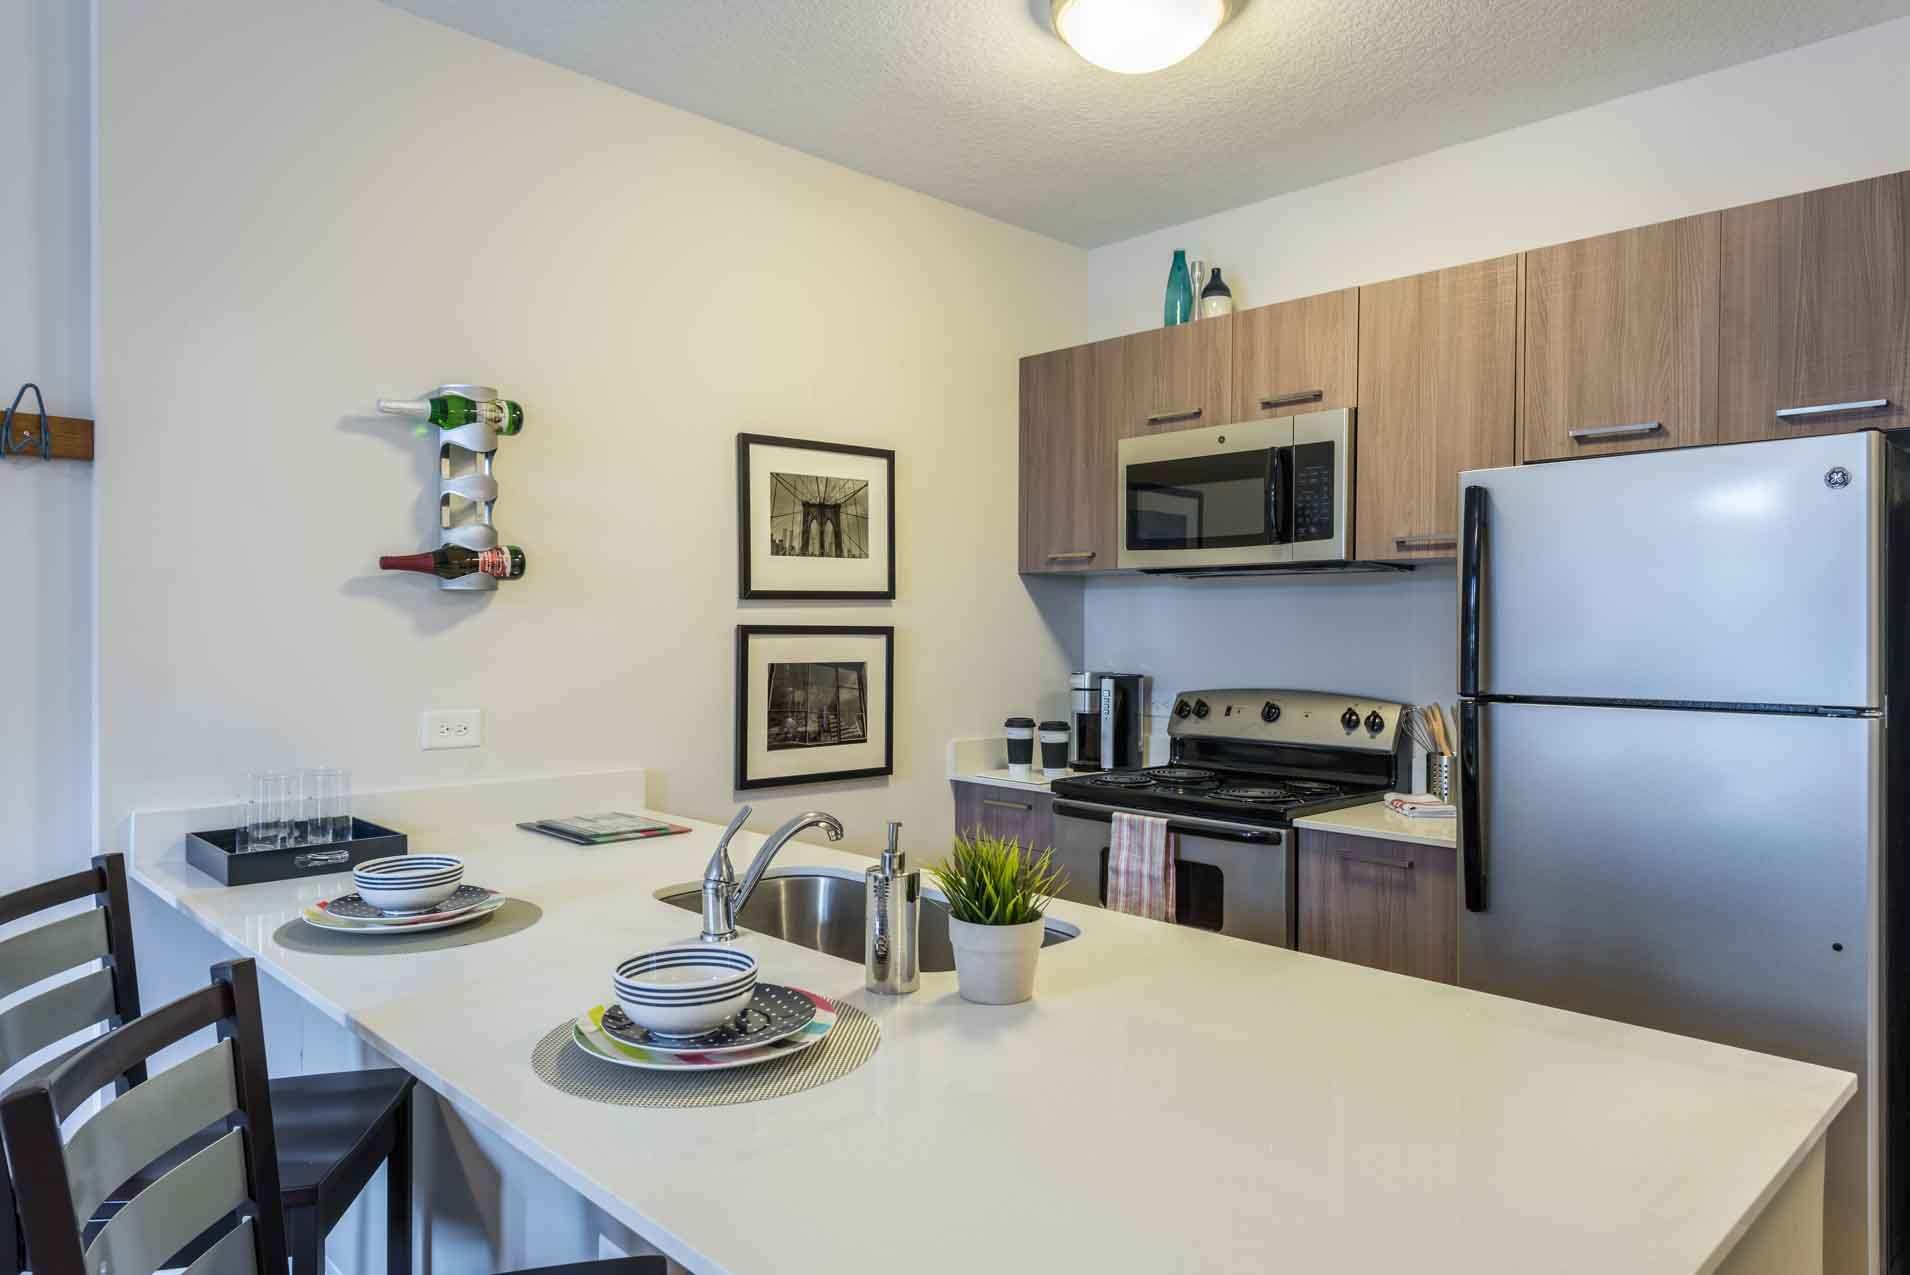 4th-Street-Commons-Miami-Kitchen-Unilodgers